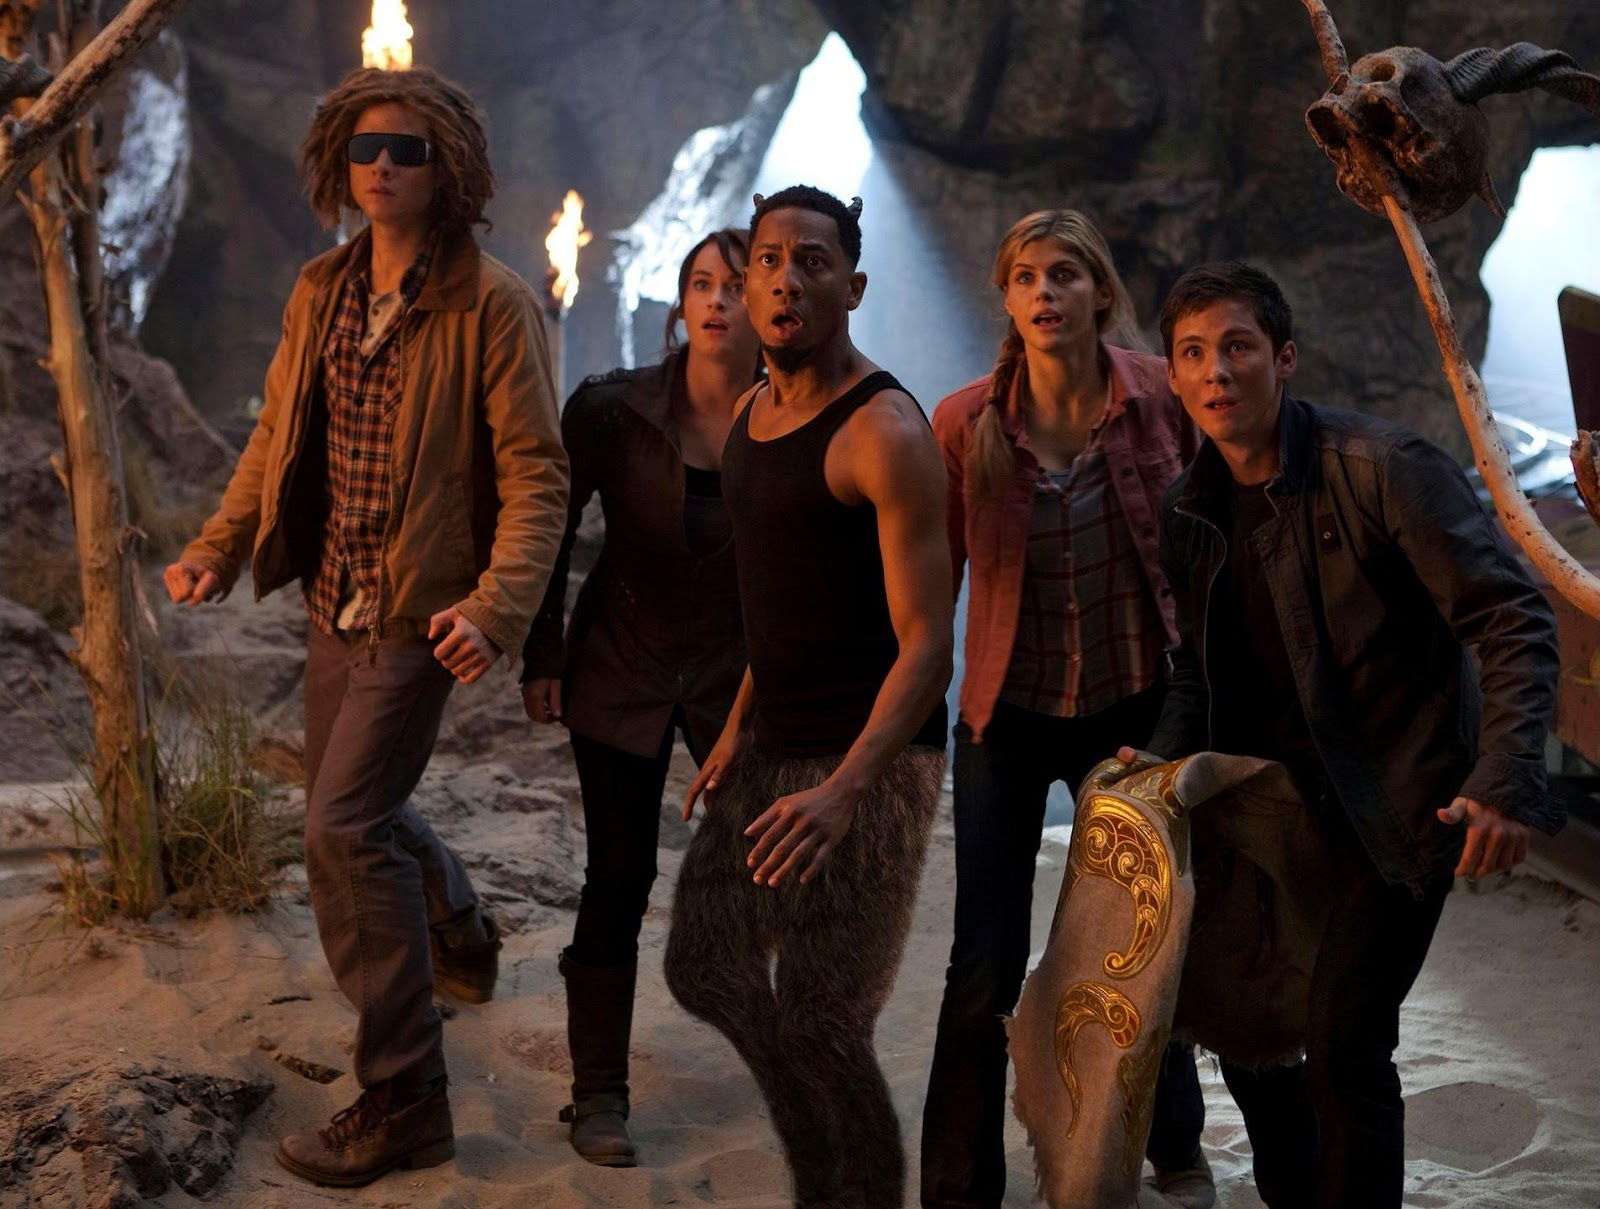 Douglas Smith como Tyson, Leven Rambin como Clarisse, Brandon T. Jackson como Grover, Alexandra Daddario como Annabeth y Logan Lerman como Percy.